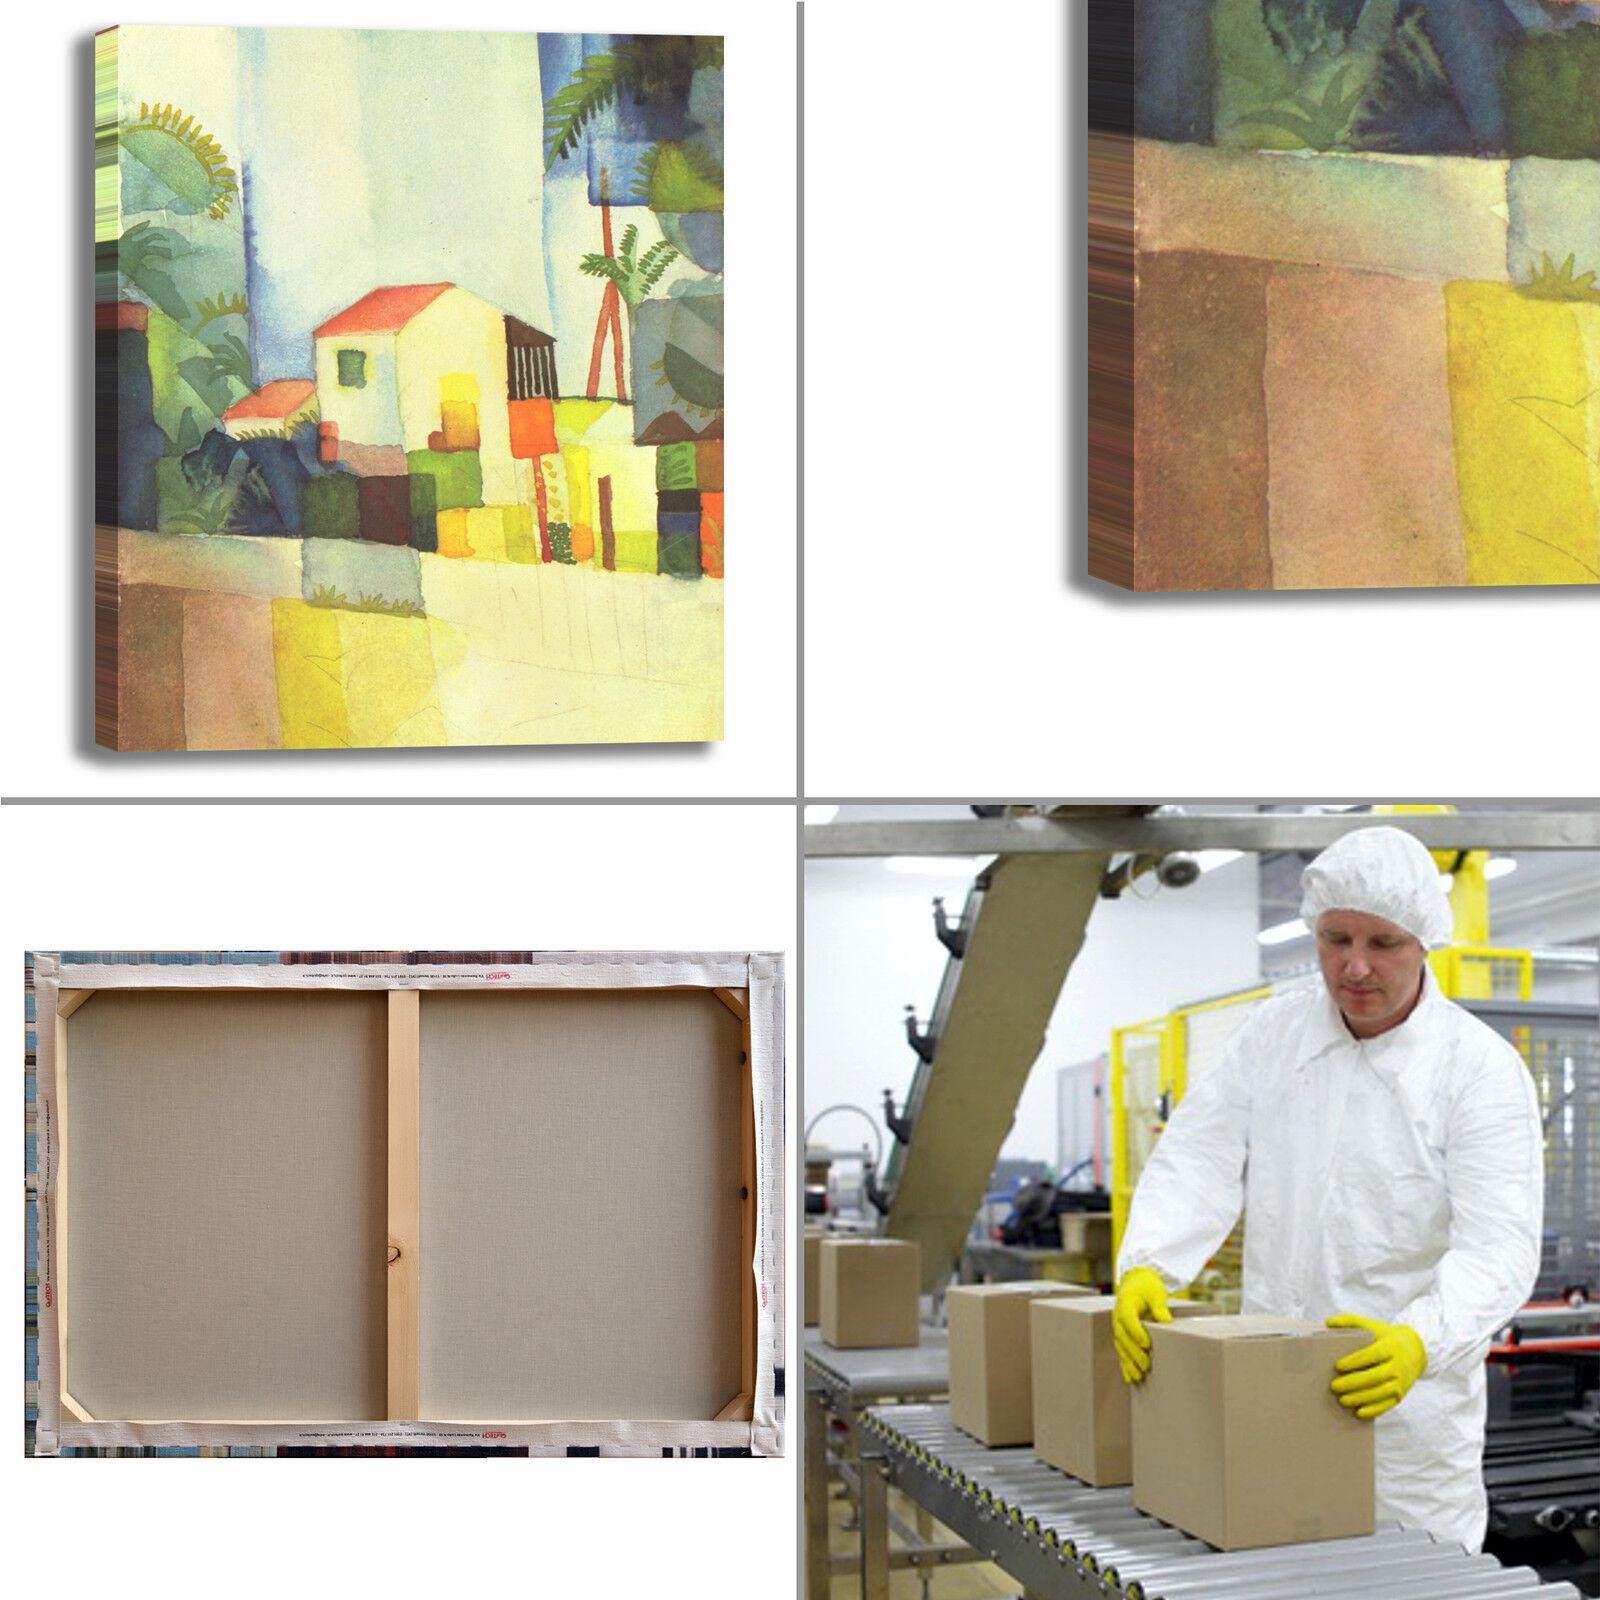 Macke casa tela luminosa design quadro stampa tela casa dipinto telaio arRouge o casa ec70e3